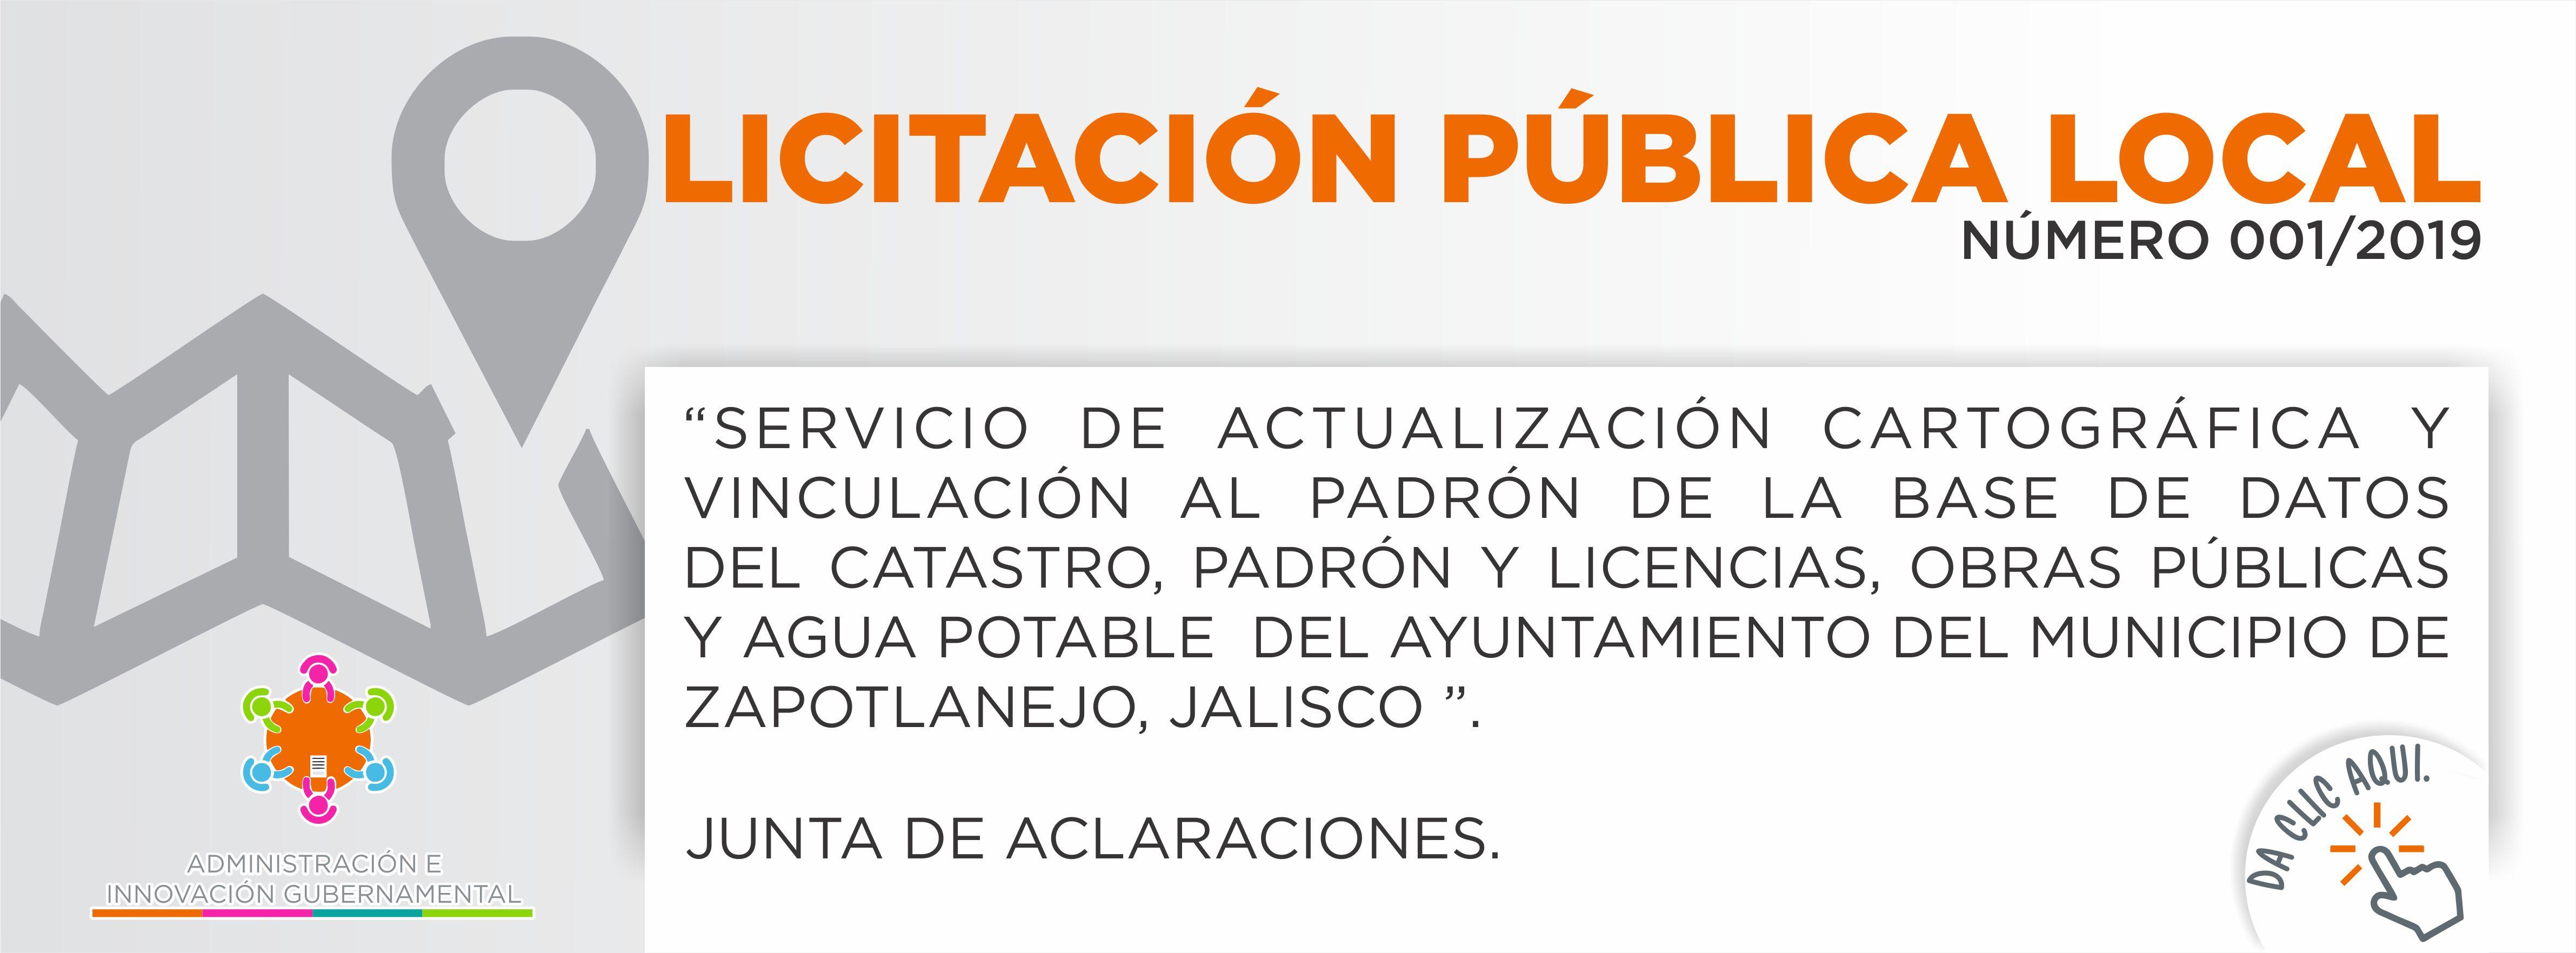 licitacion-publica-local-3.jpg